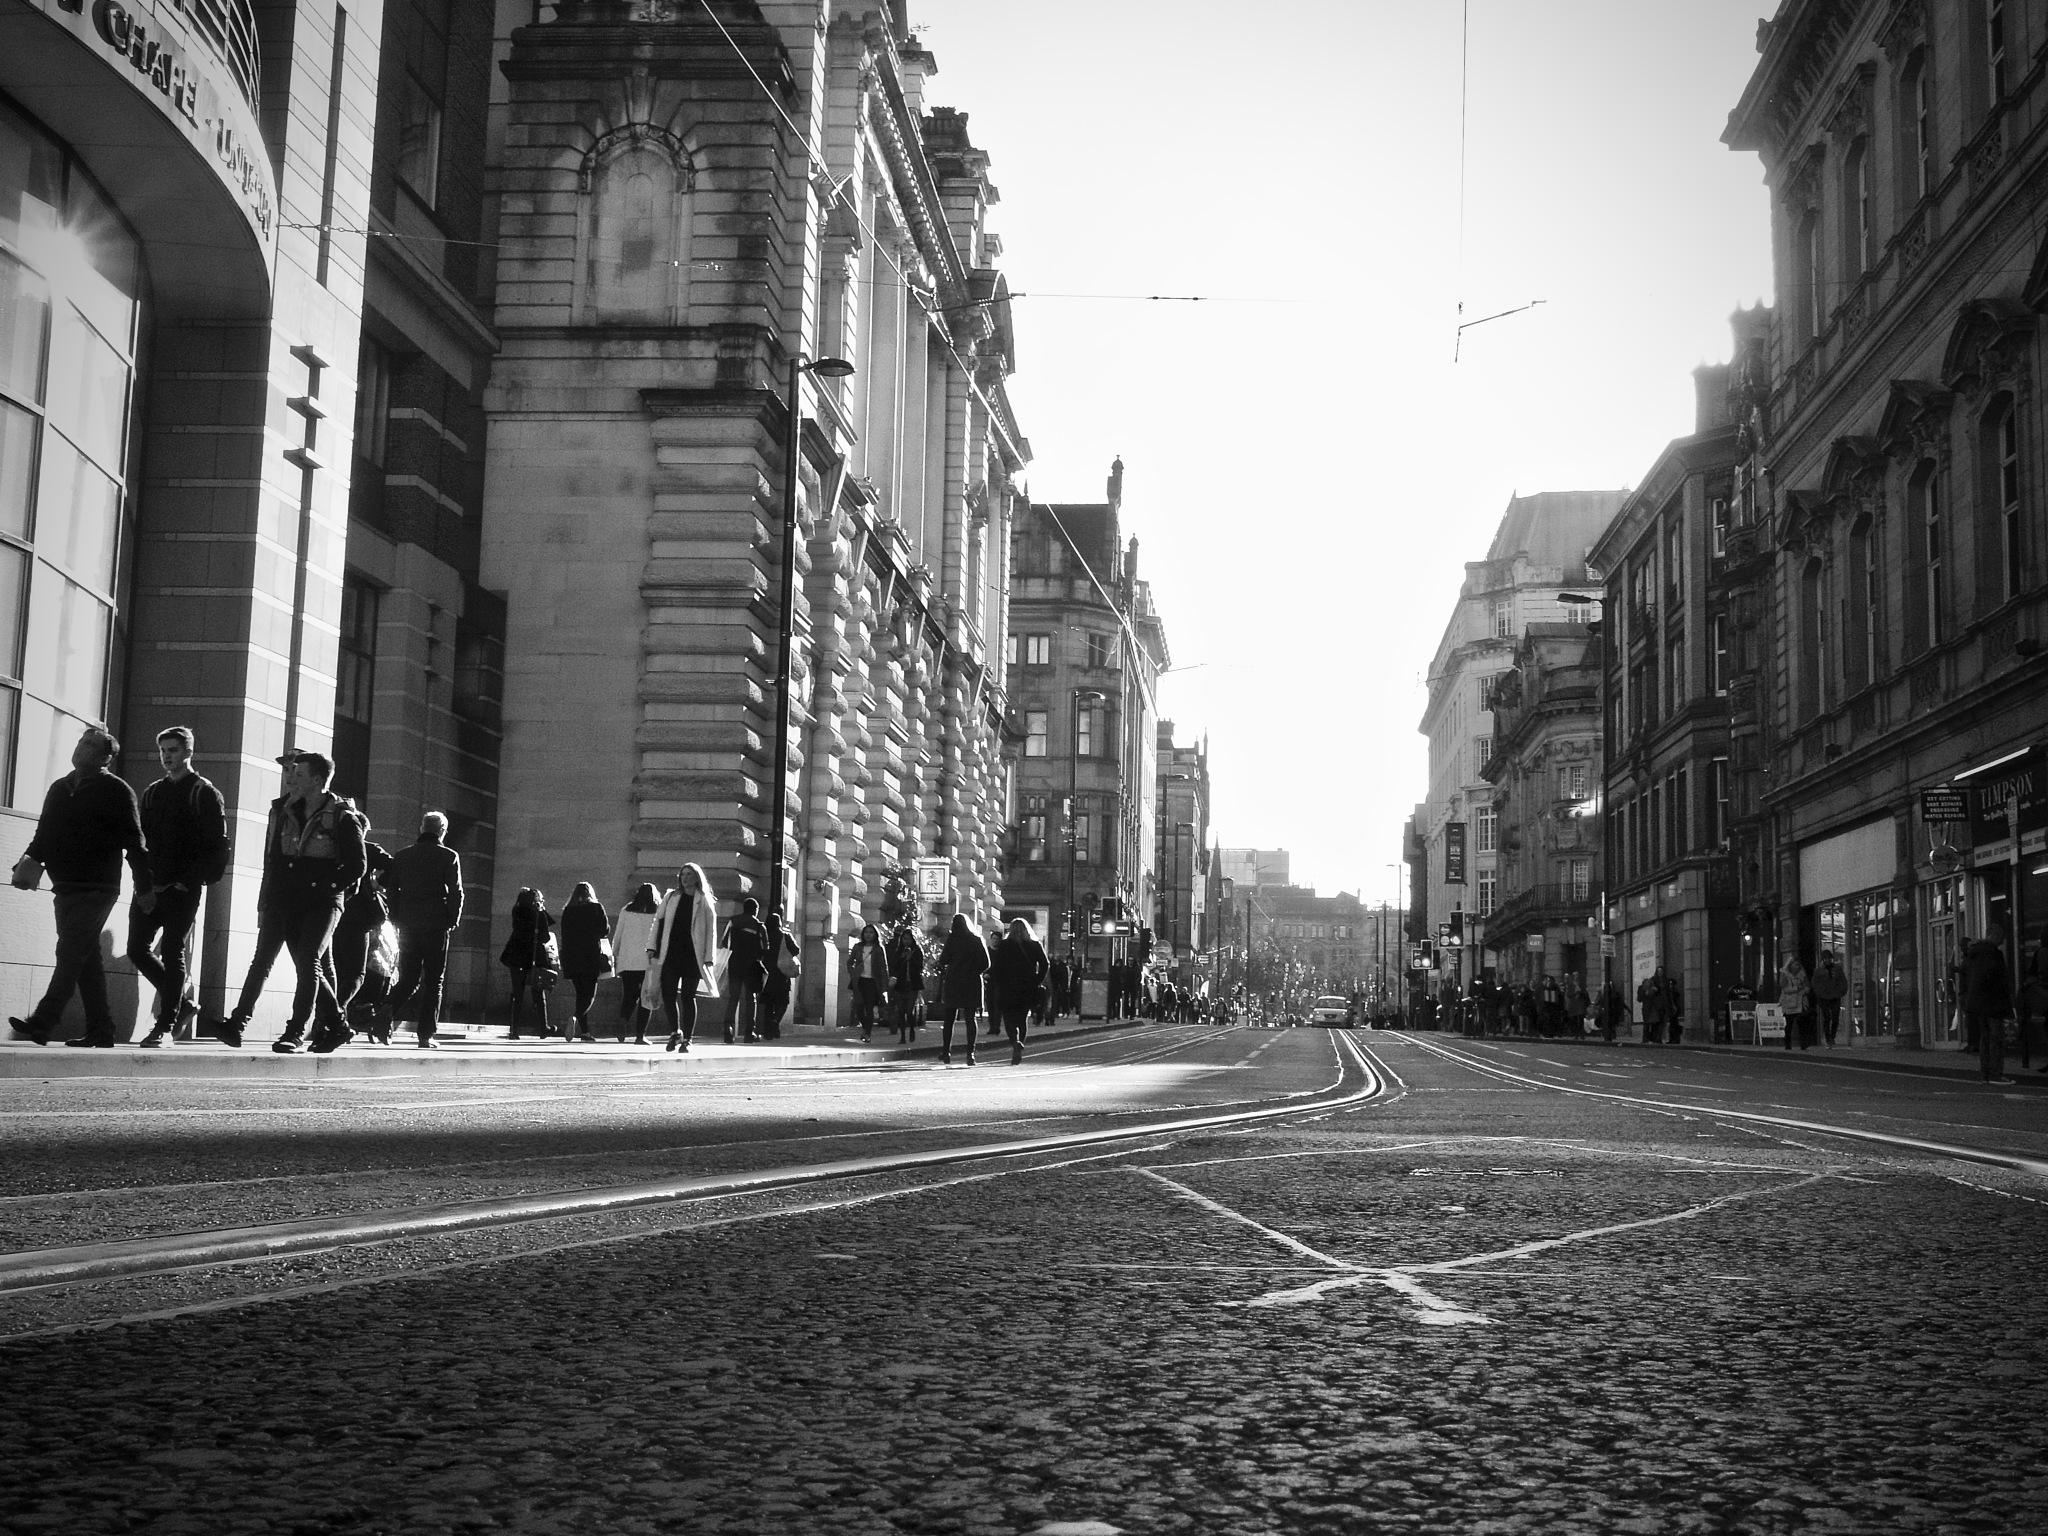 Cross Street, Manchester City Centre, Manchester, UK. by StreetCrusader